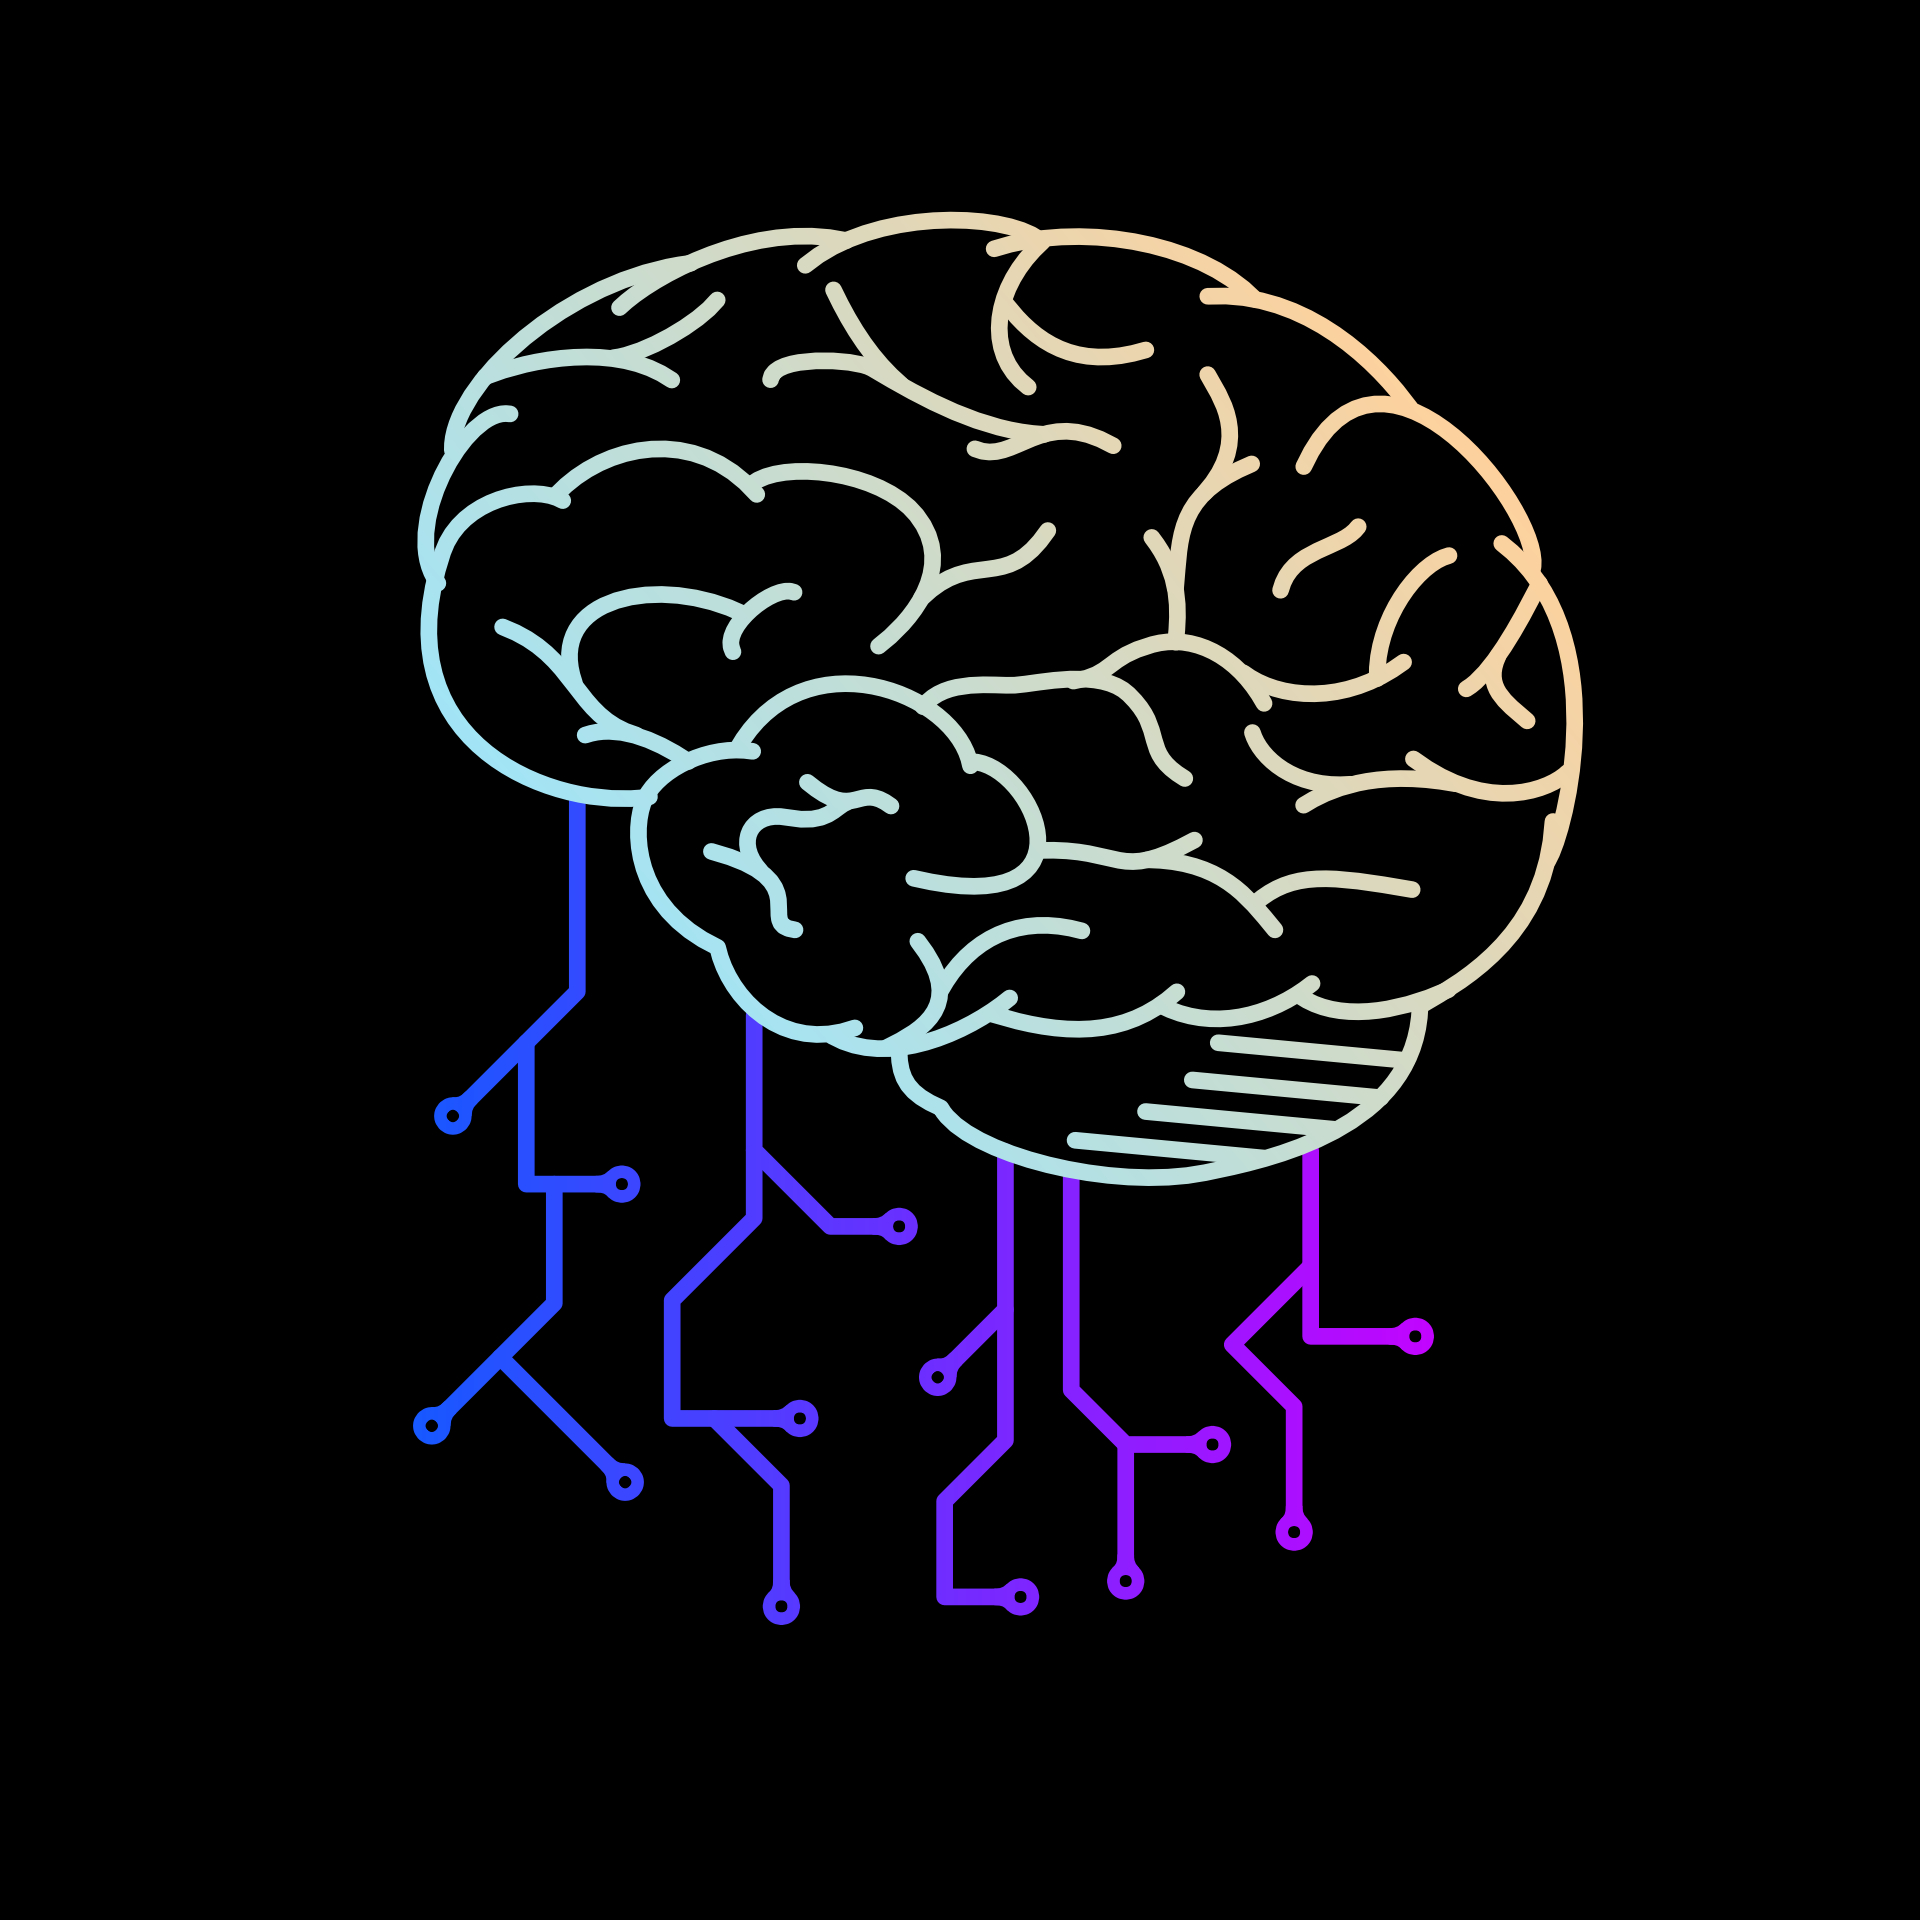 BrainNodesBlackB.jpg